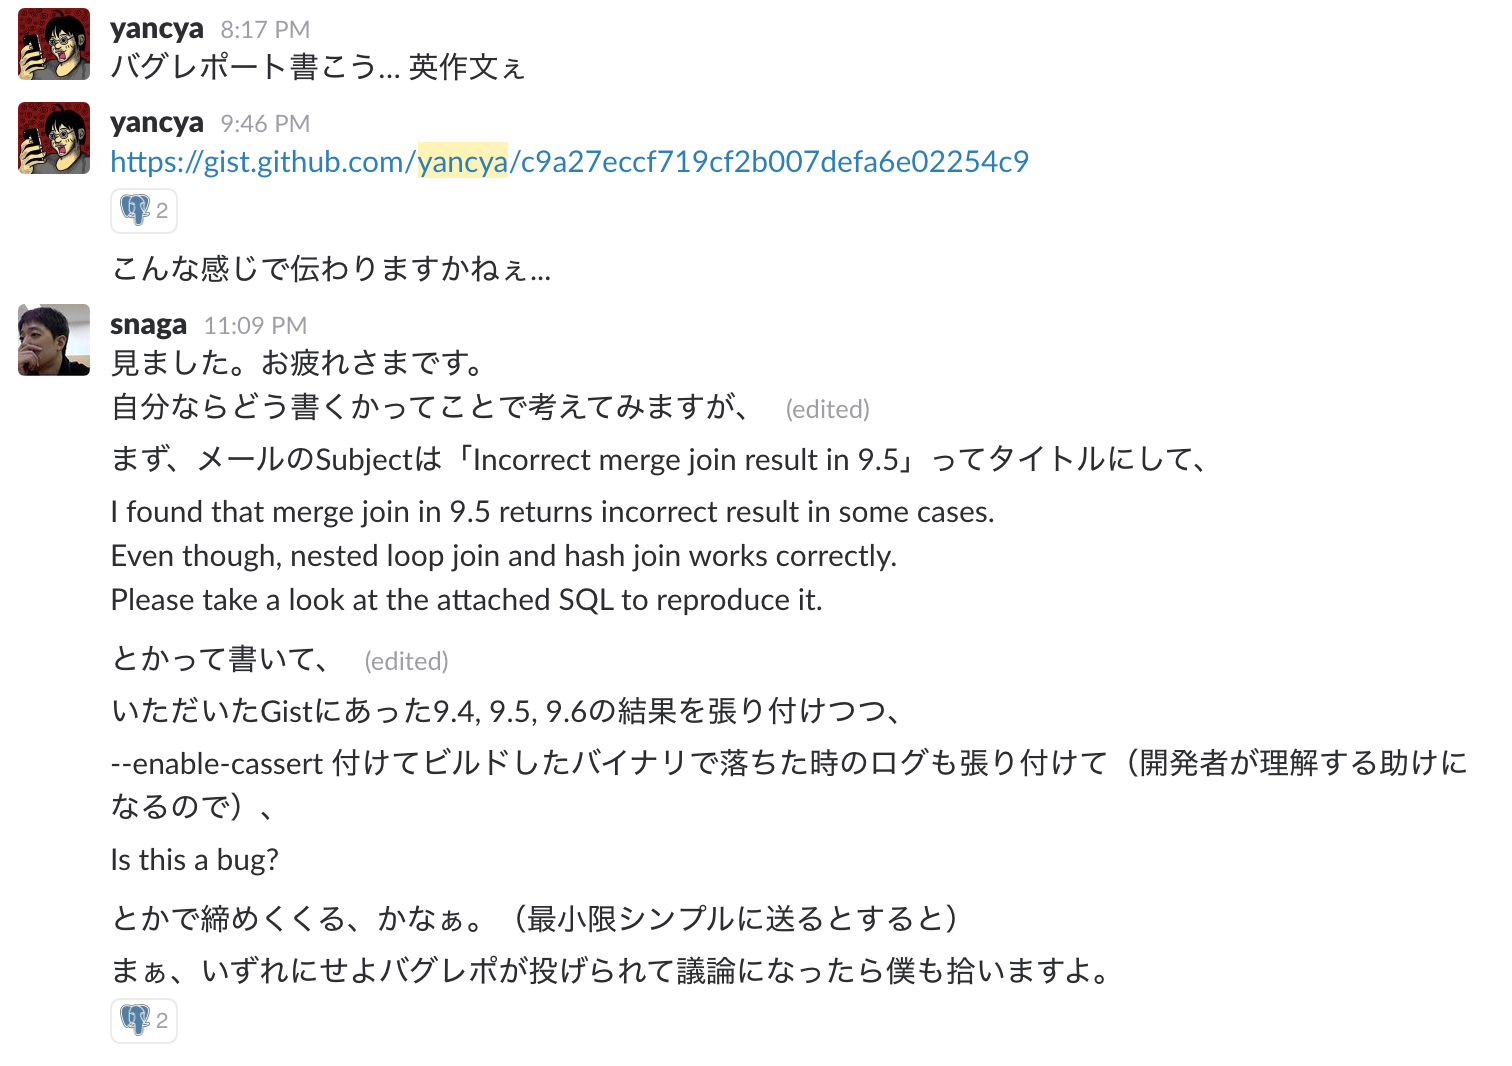 Slack_-_postgresql-jp 3.png